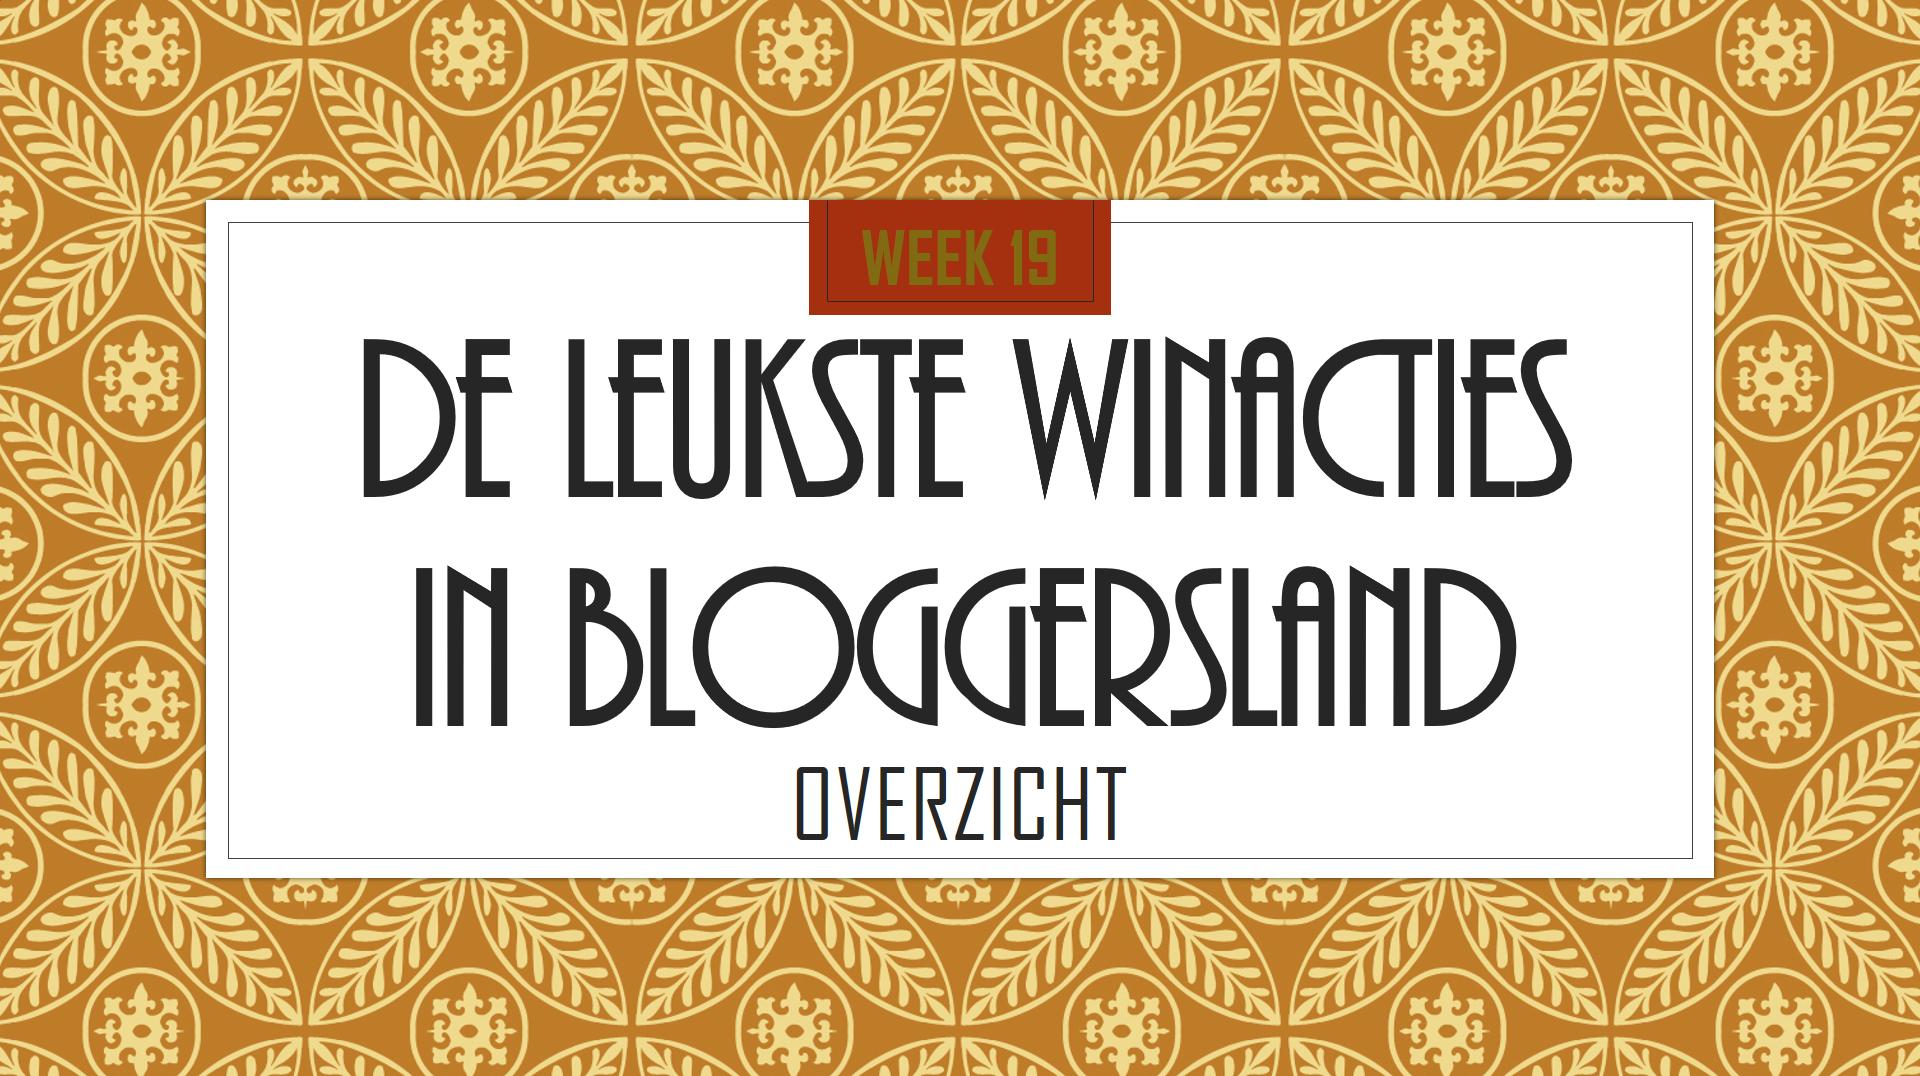 Leukste Blogger winacties wk 19